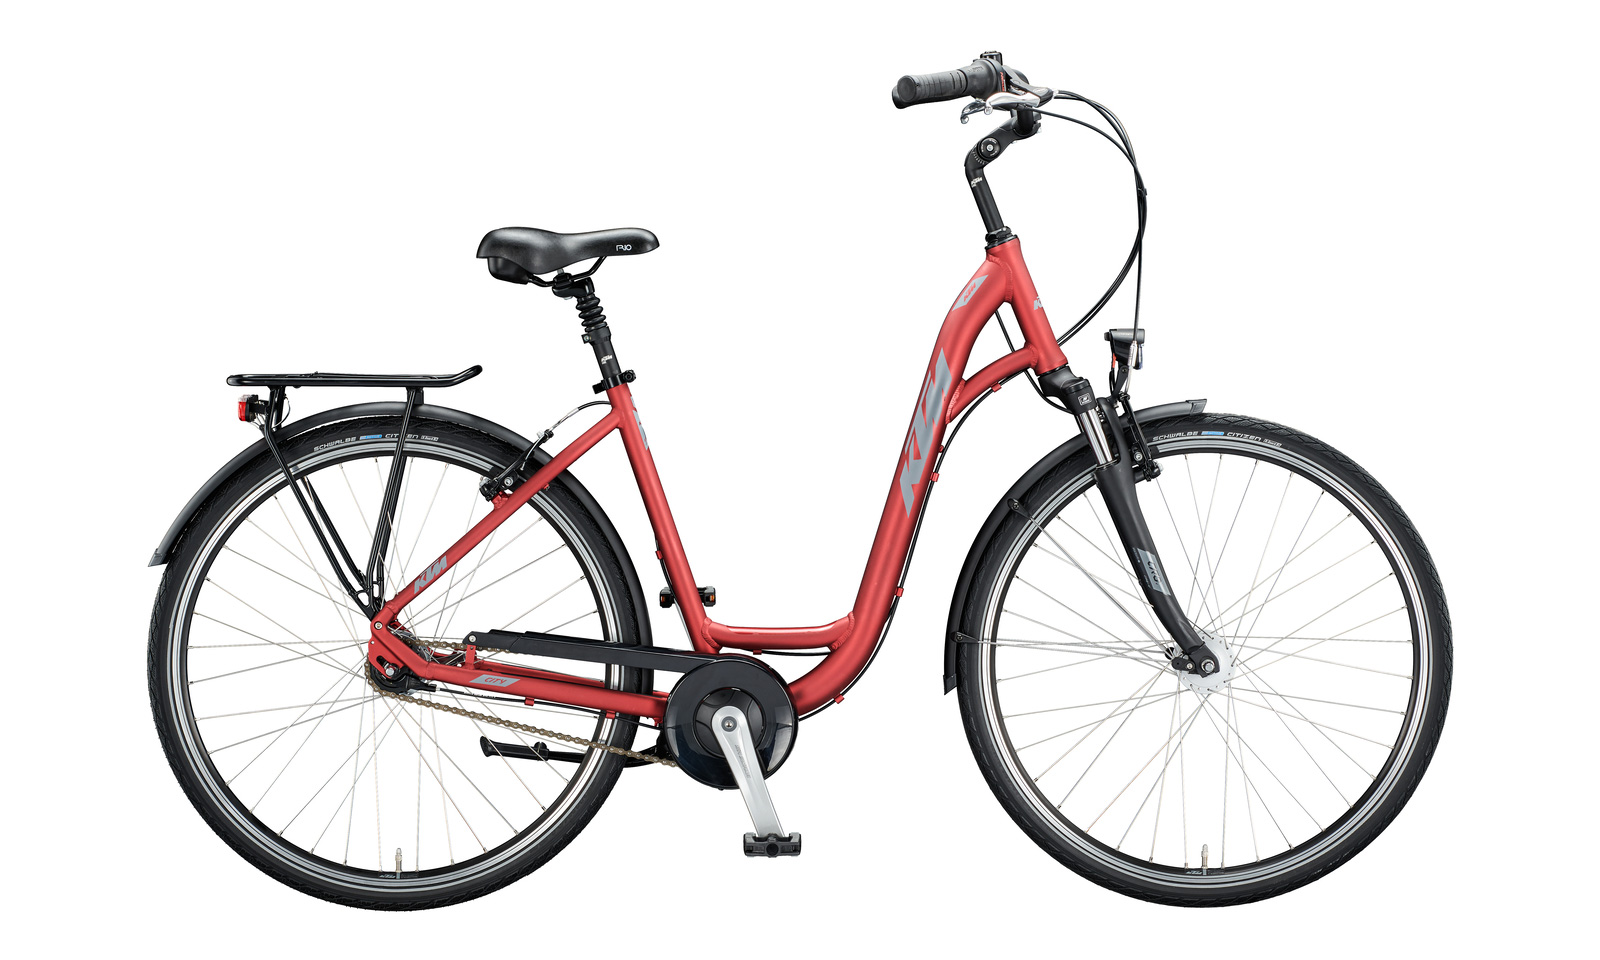 Biciclete KTM City CITY LINE 28.7 1x7 Shimano Nexus